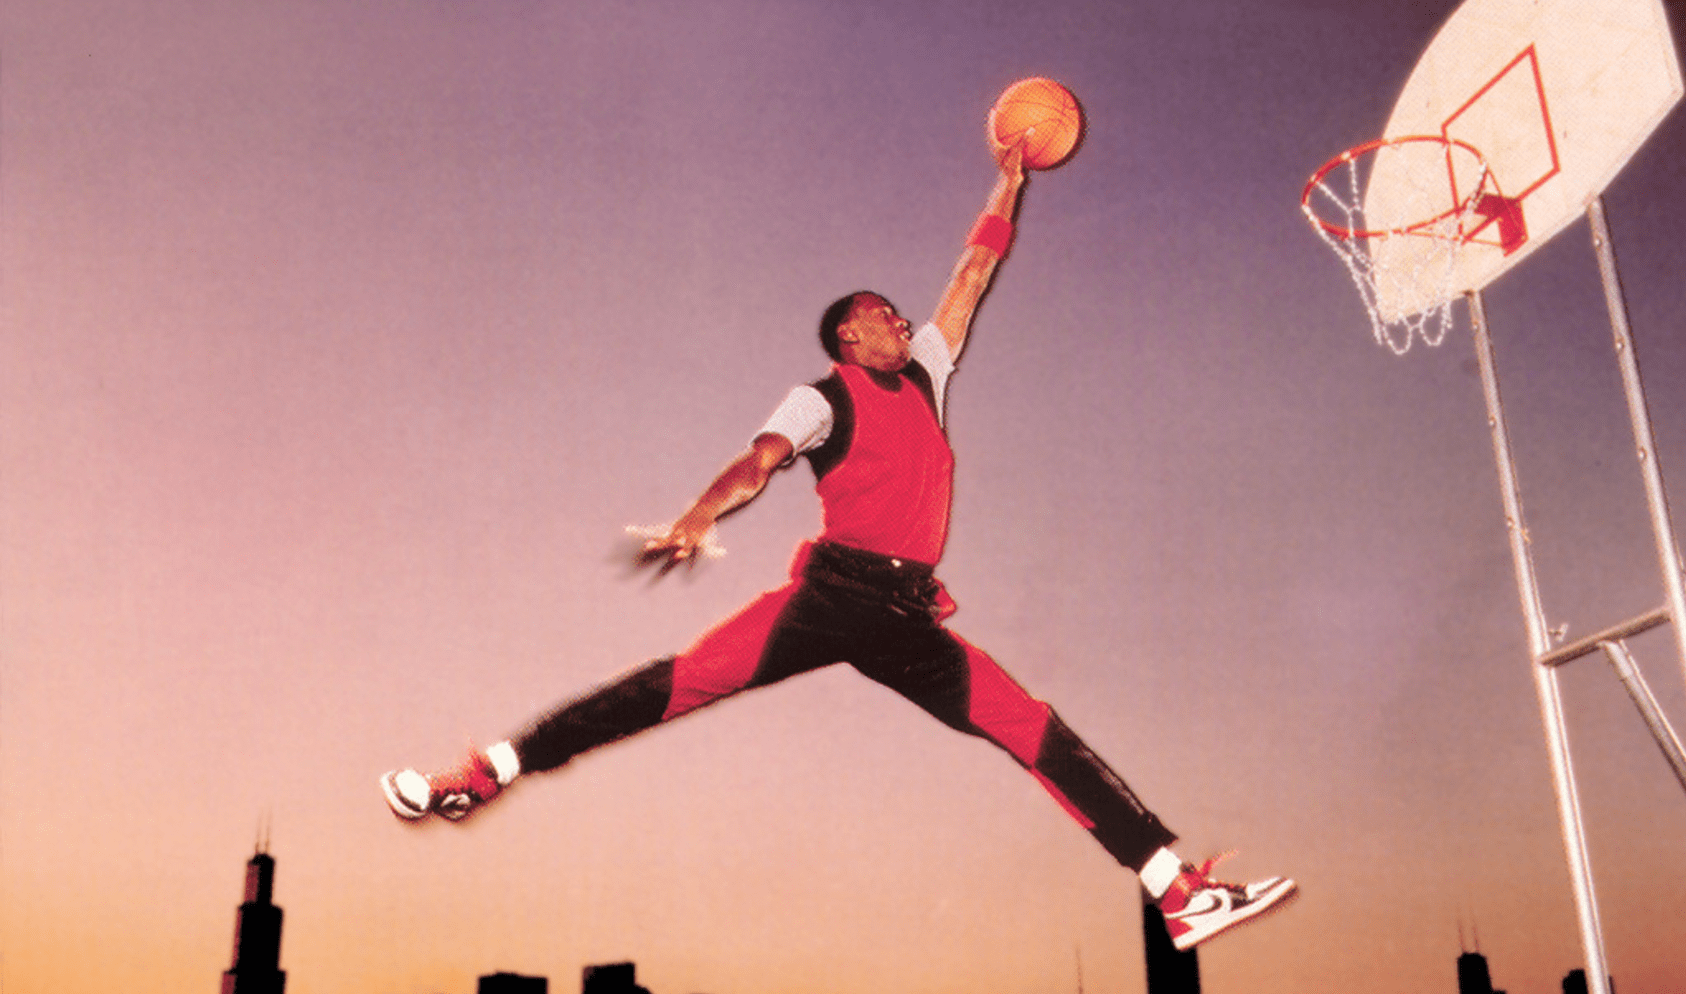 Jumpman - La petite histoire du logo Jordan Brand